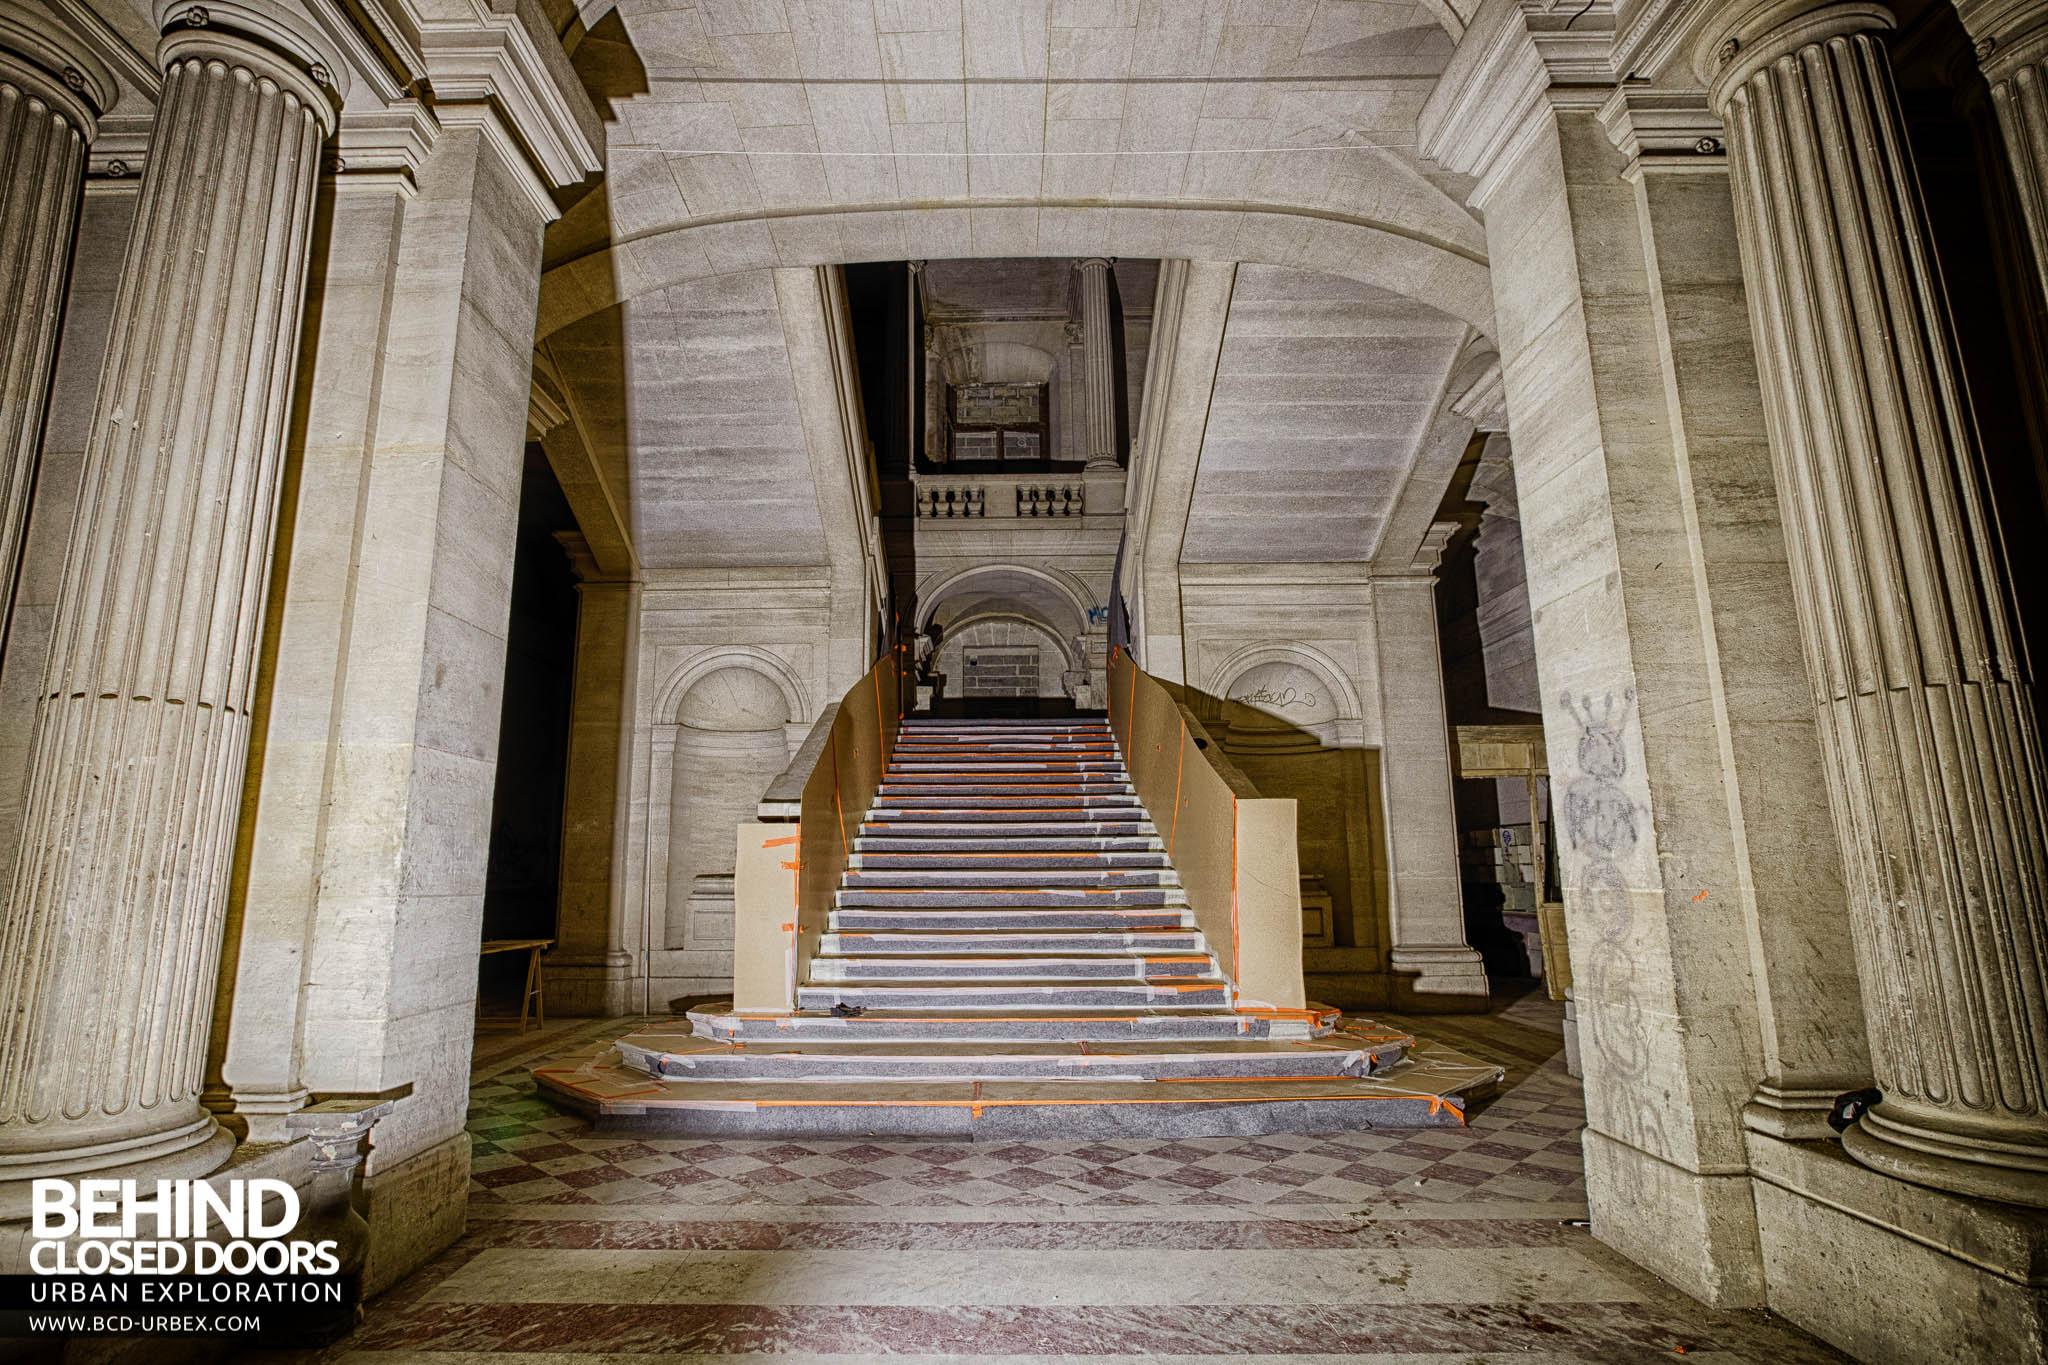 Chateau De Carnelle The Main Staircase Inside Prepared